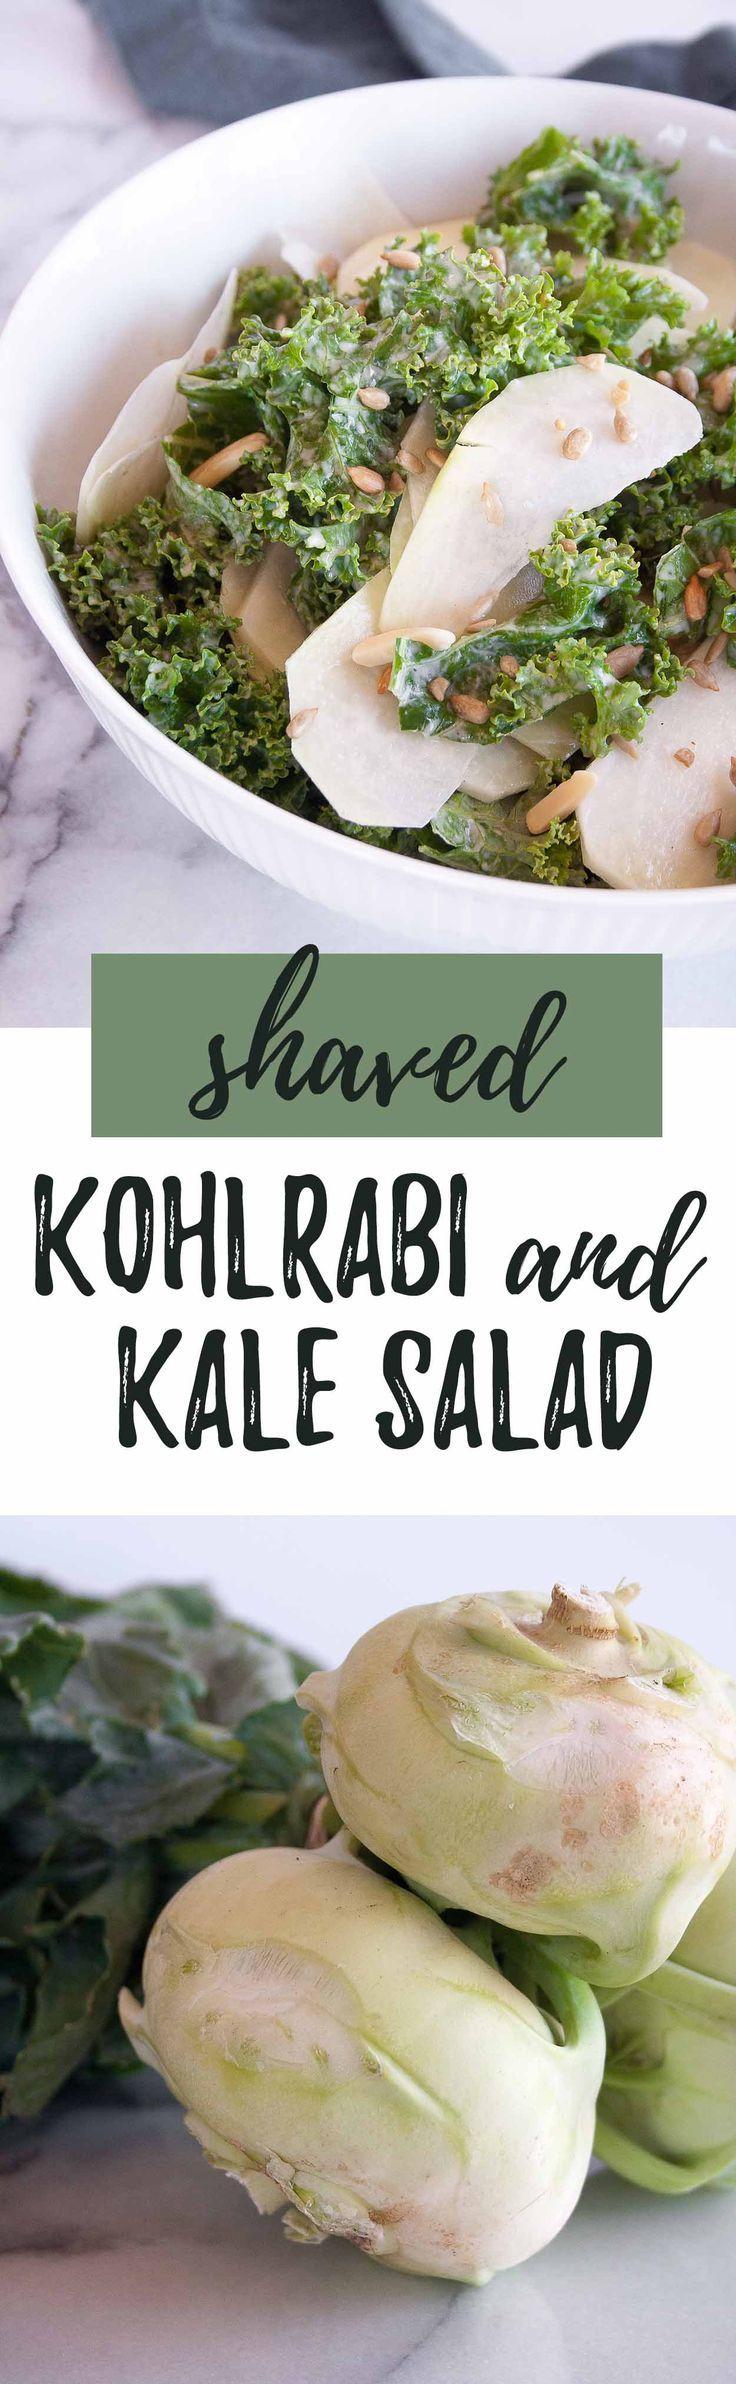 Shaved Kohlrabi and Kale Salad with Lemon-Tahini Dressing   kohlrabi recipe, raw, spiralized, easy, healthy, gluten free, dairy free, paleo, vegan, whole30   hungrybynature.com